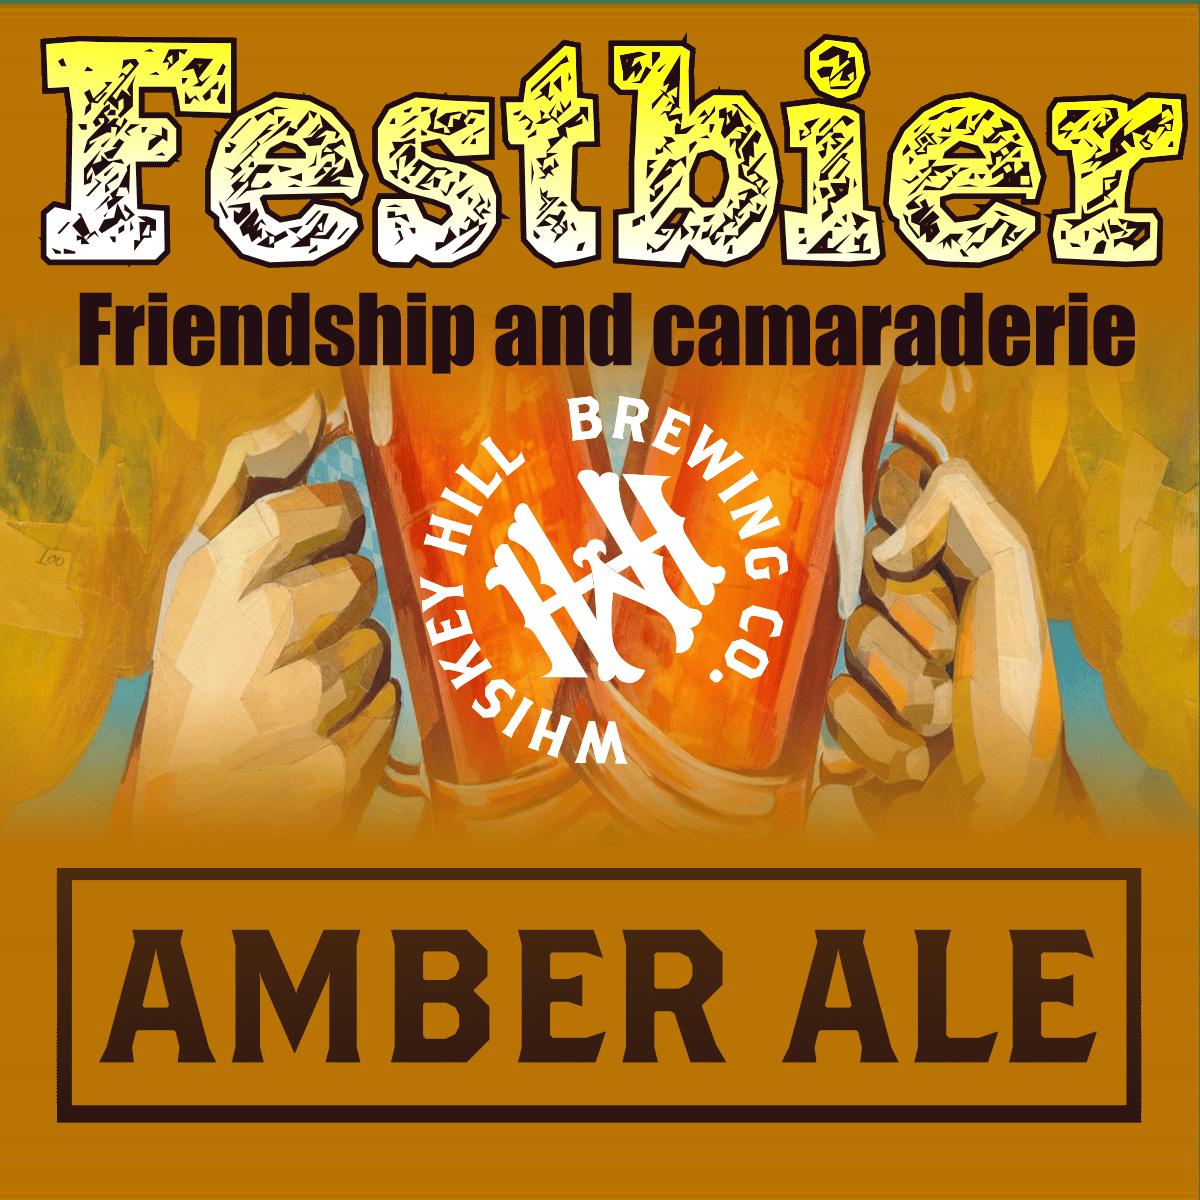 Festbier Amber